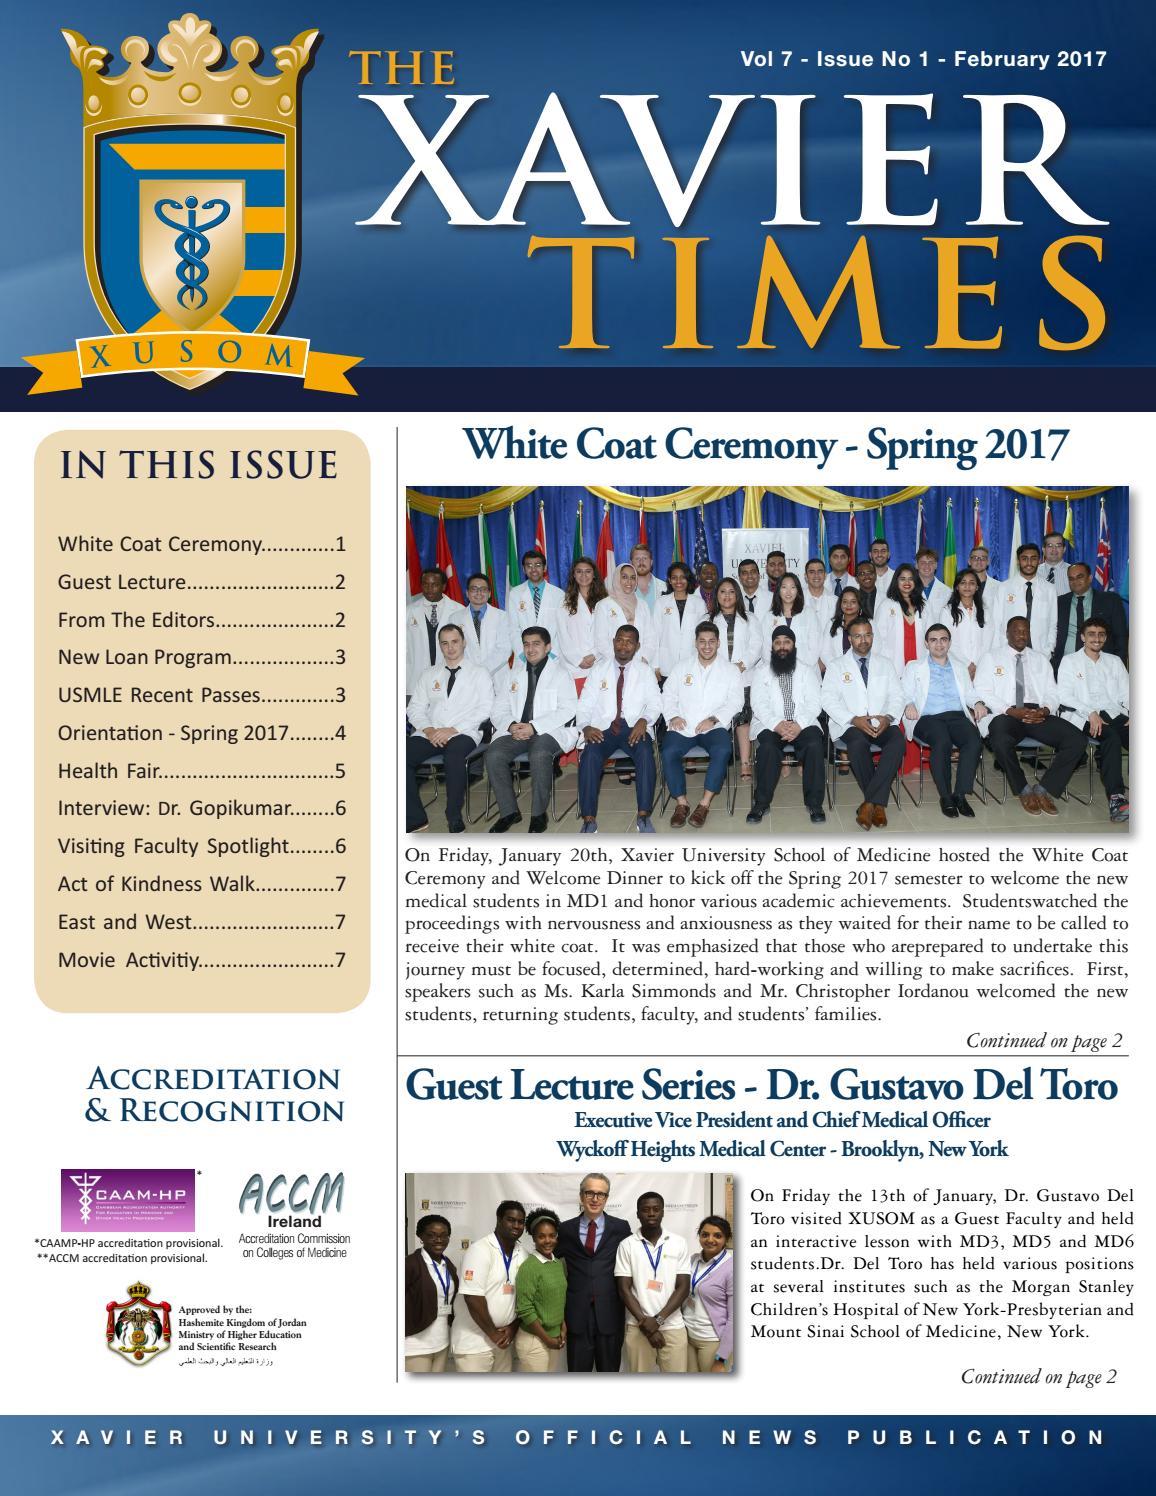 Xavier Times Feb 2017 by Xavier University School of Medicine - issuu